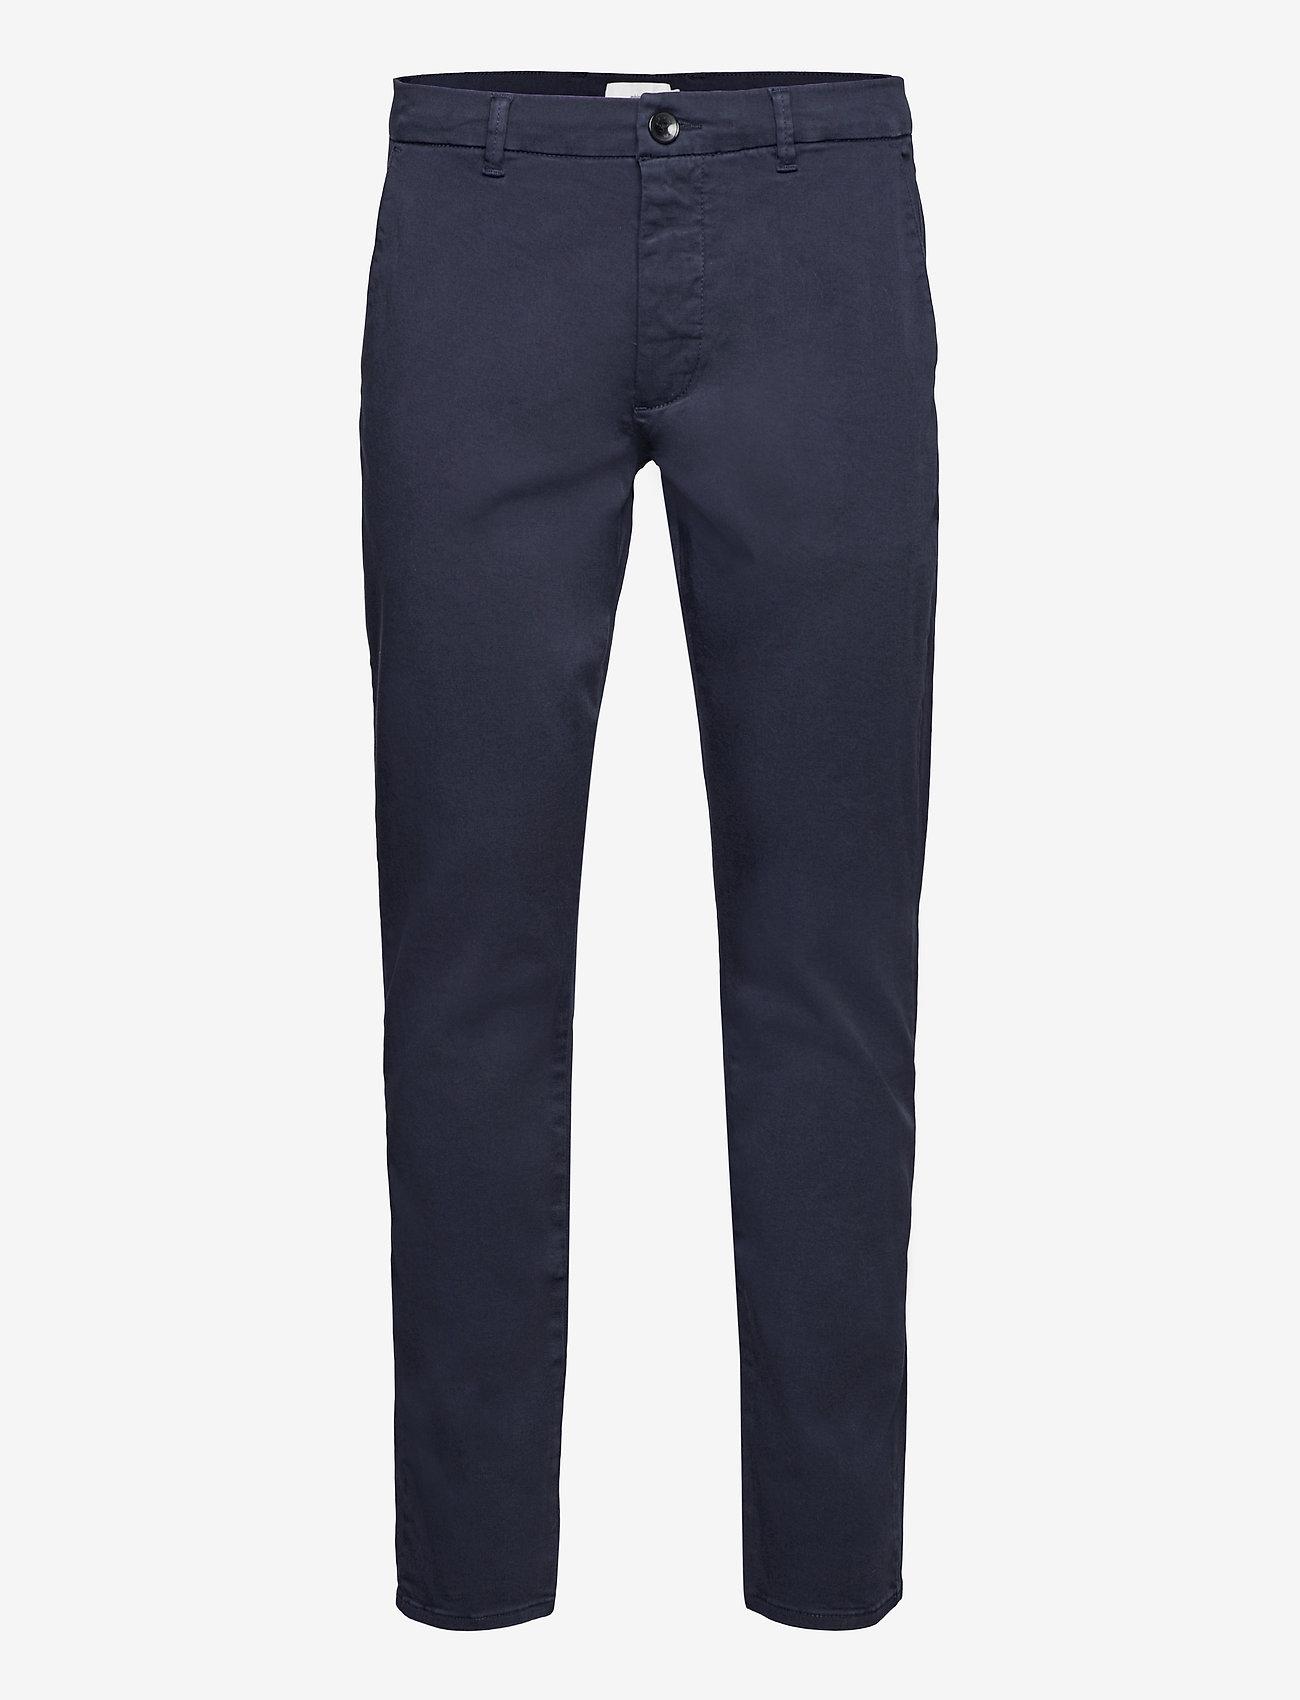 Minimum - darvis - chino's - navy blazer - 0